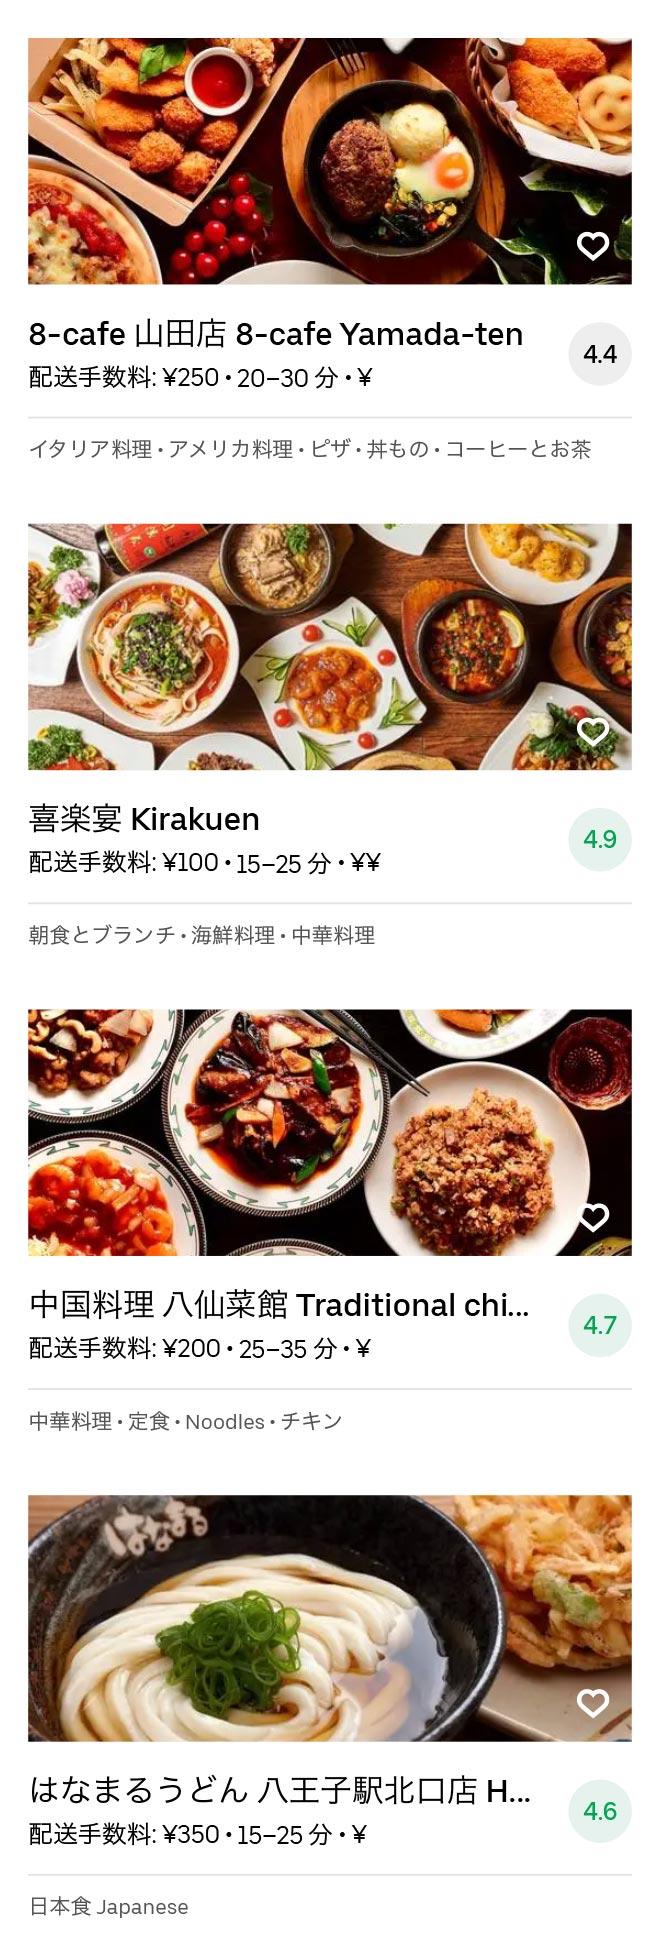 Nishi hatioji menu 2010 09